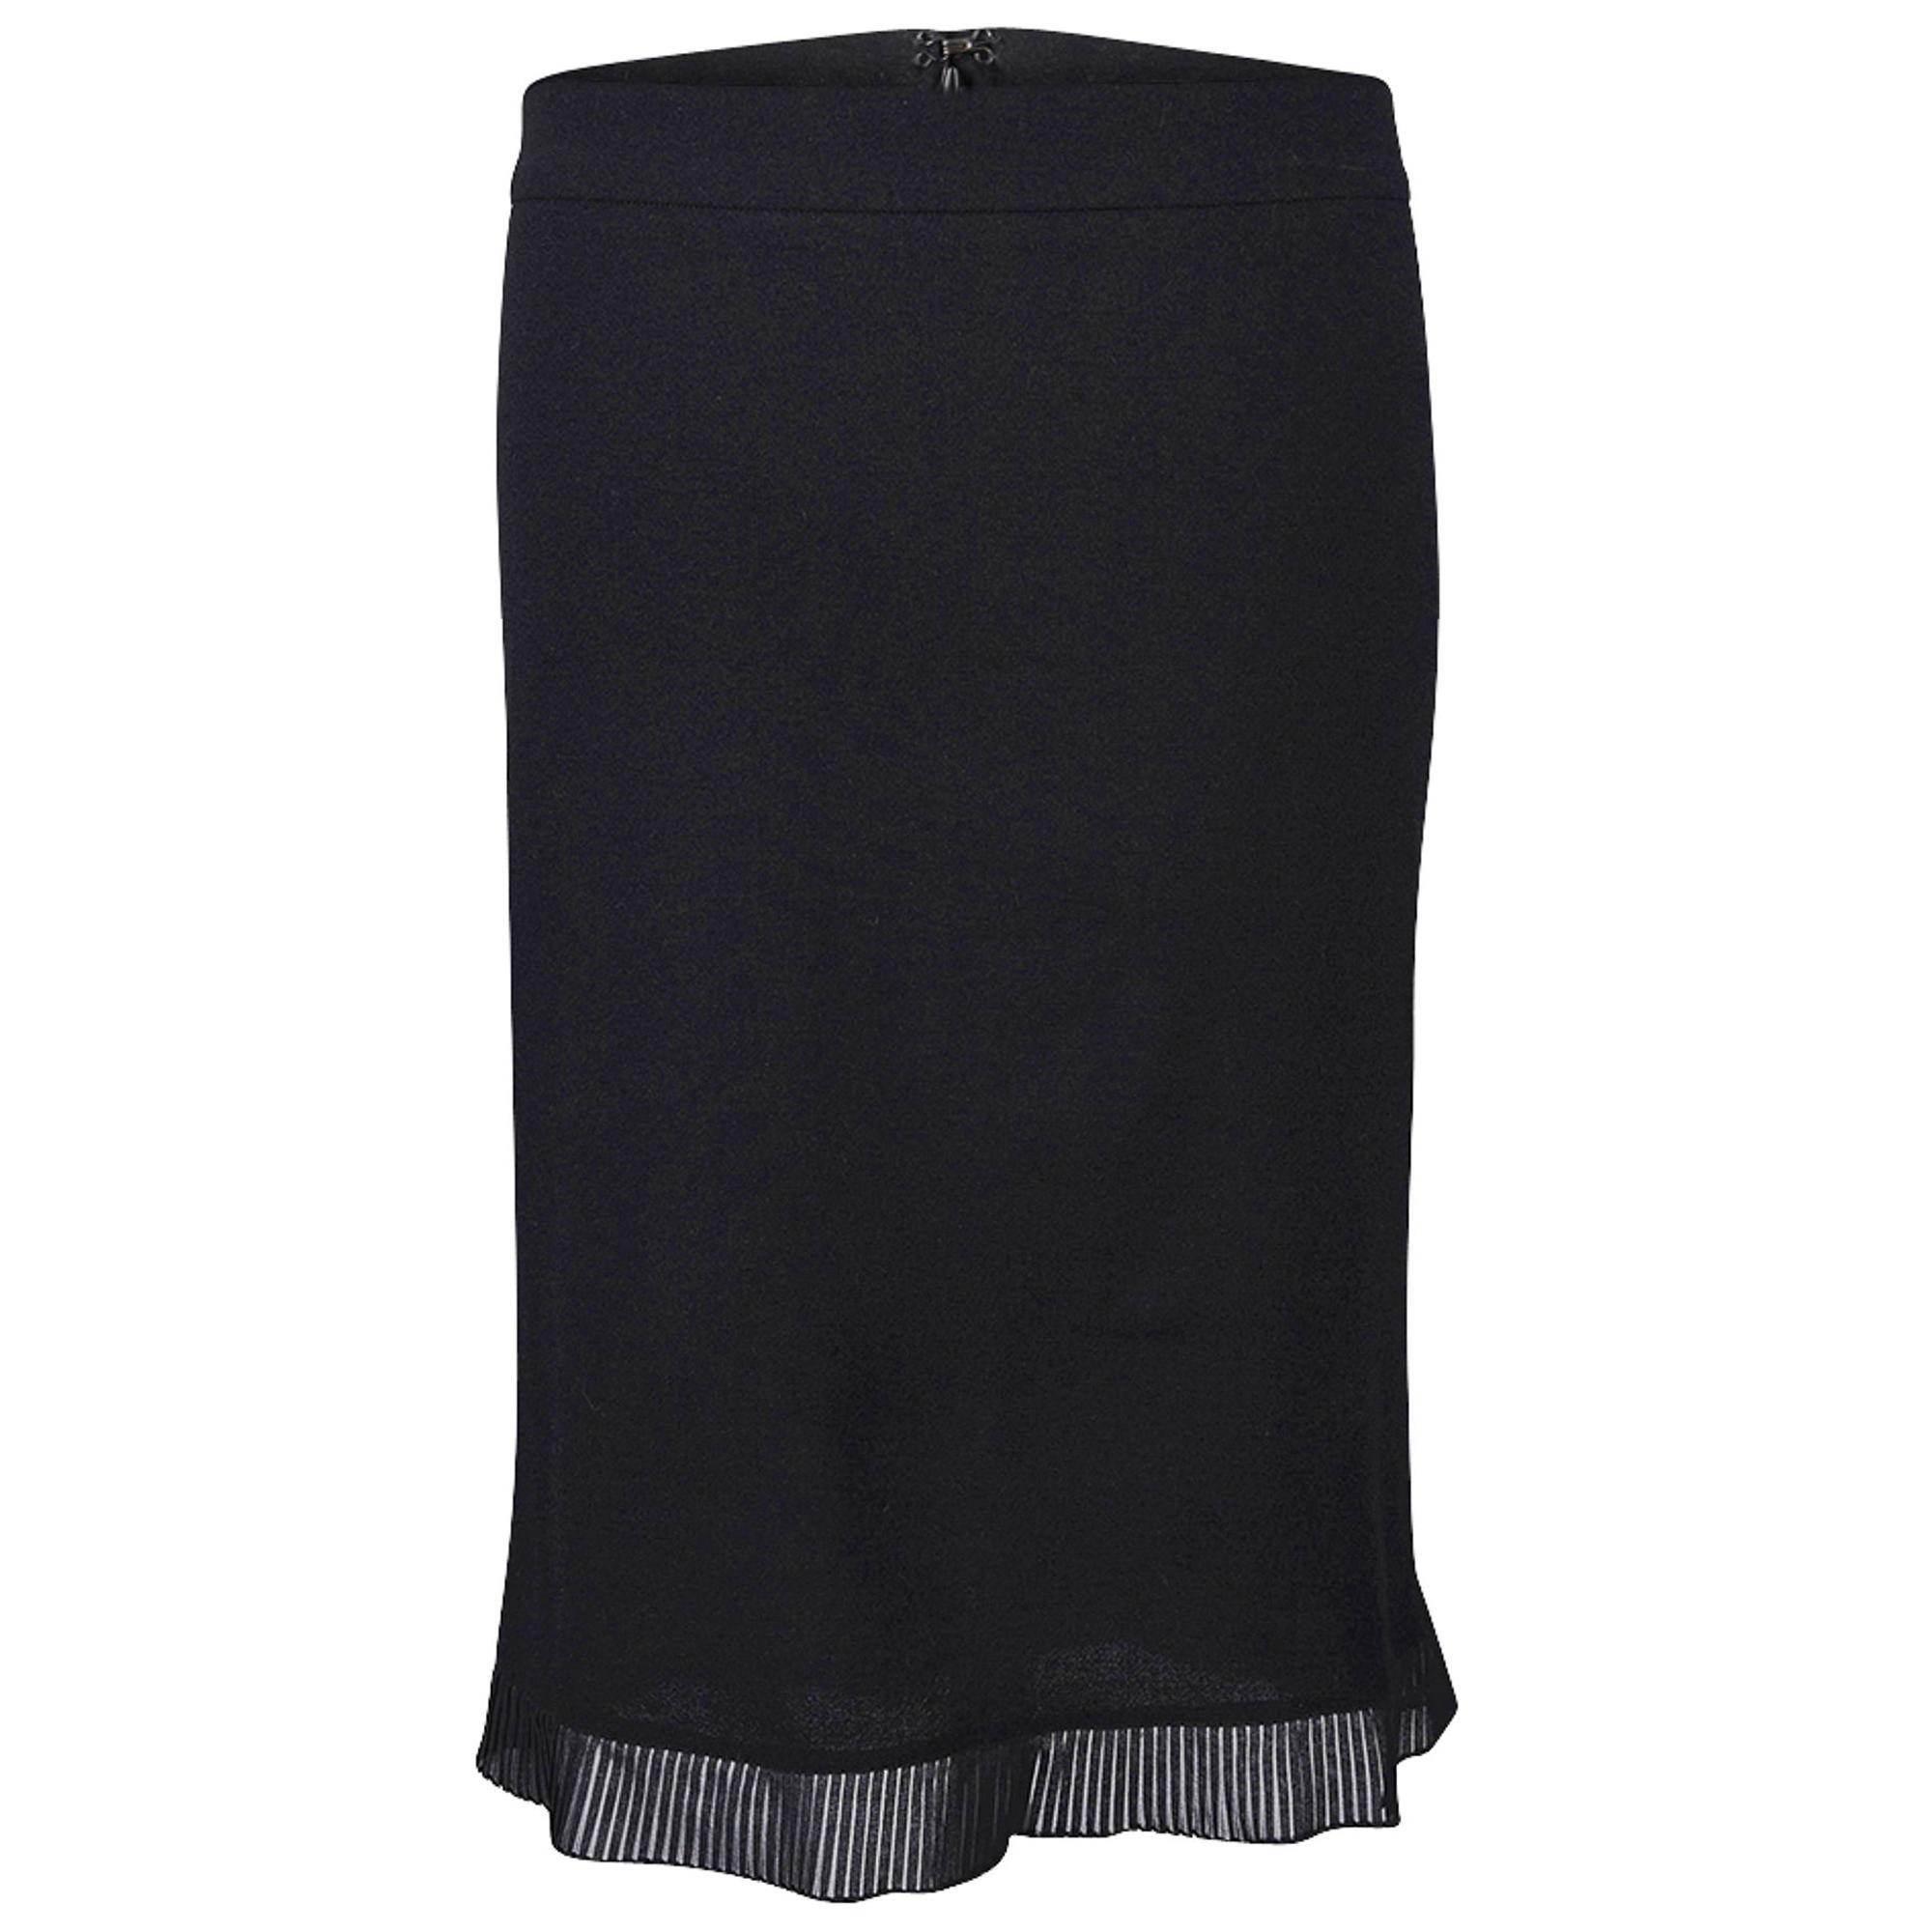 Roberto Cavalli Pencil Skirt Semi Sheer Pleated Ruffle Hem Black S